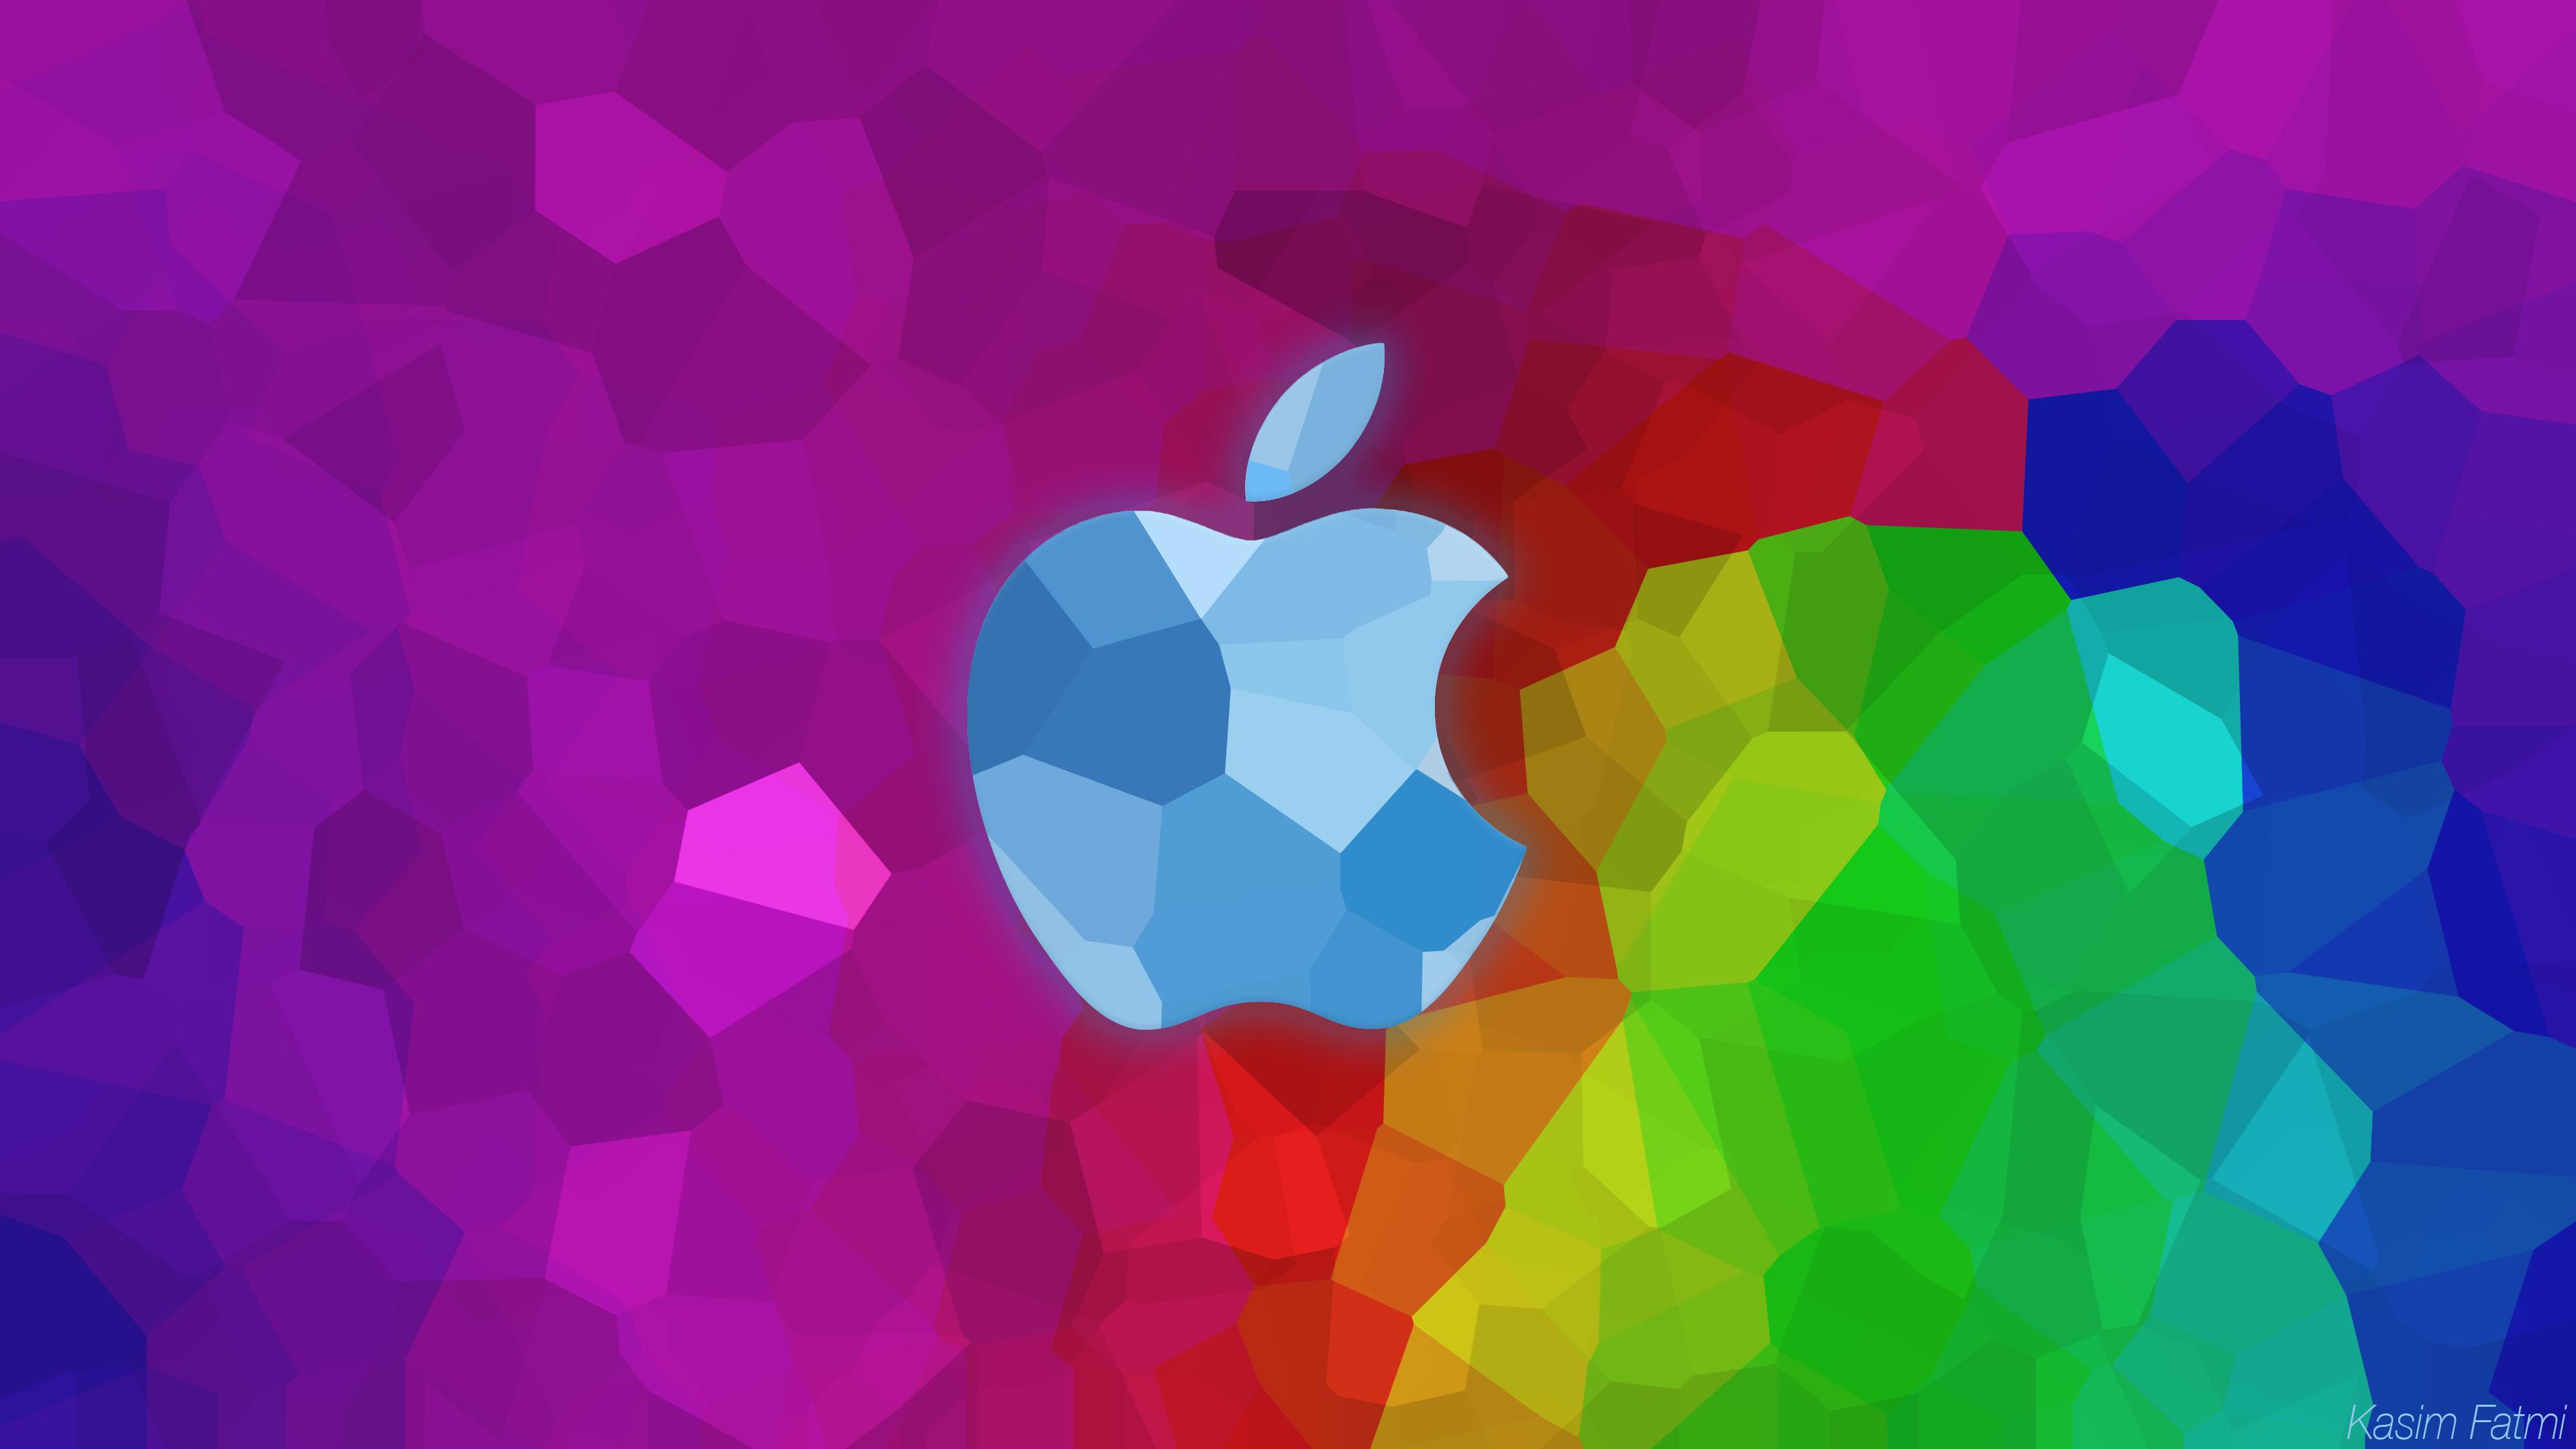 Apple Wallpaper 3 (4K)